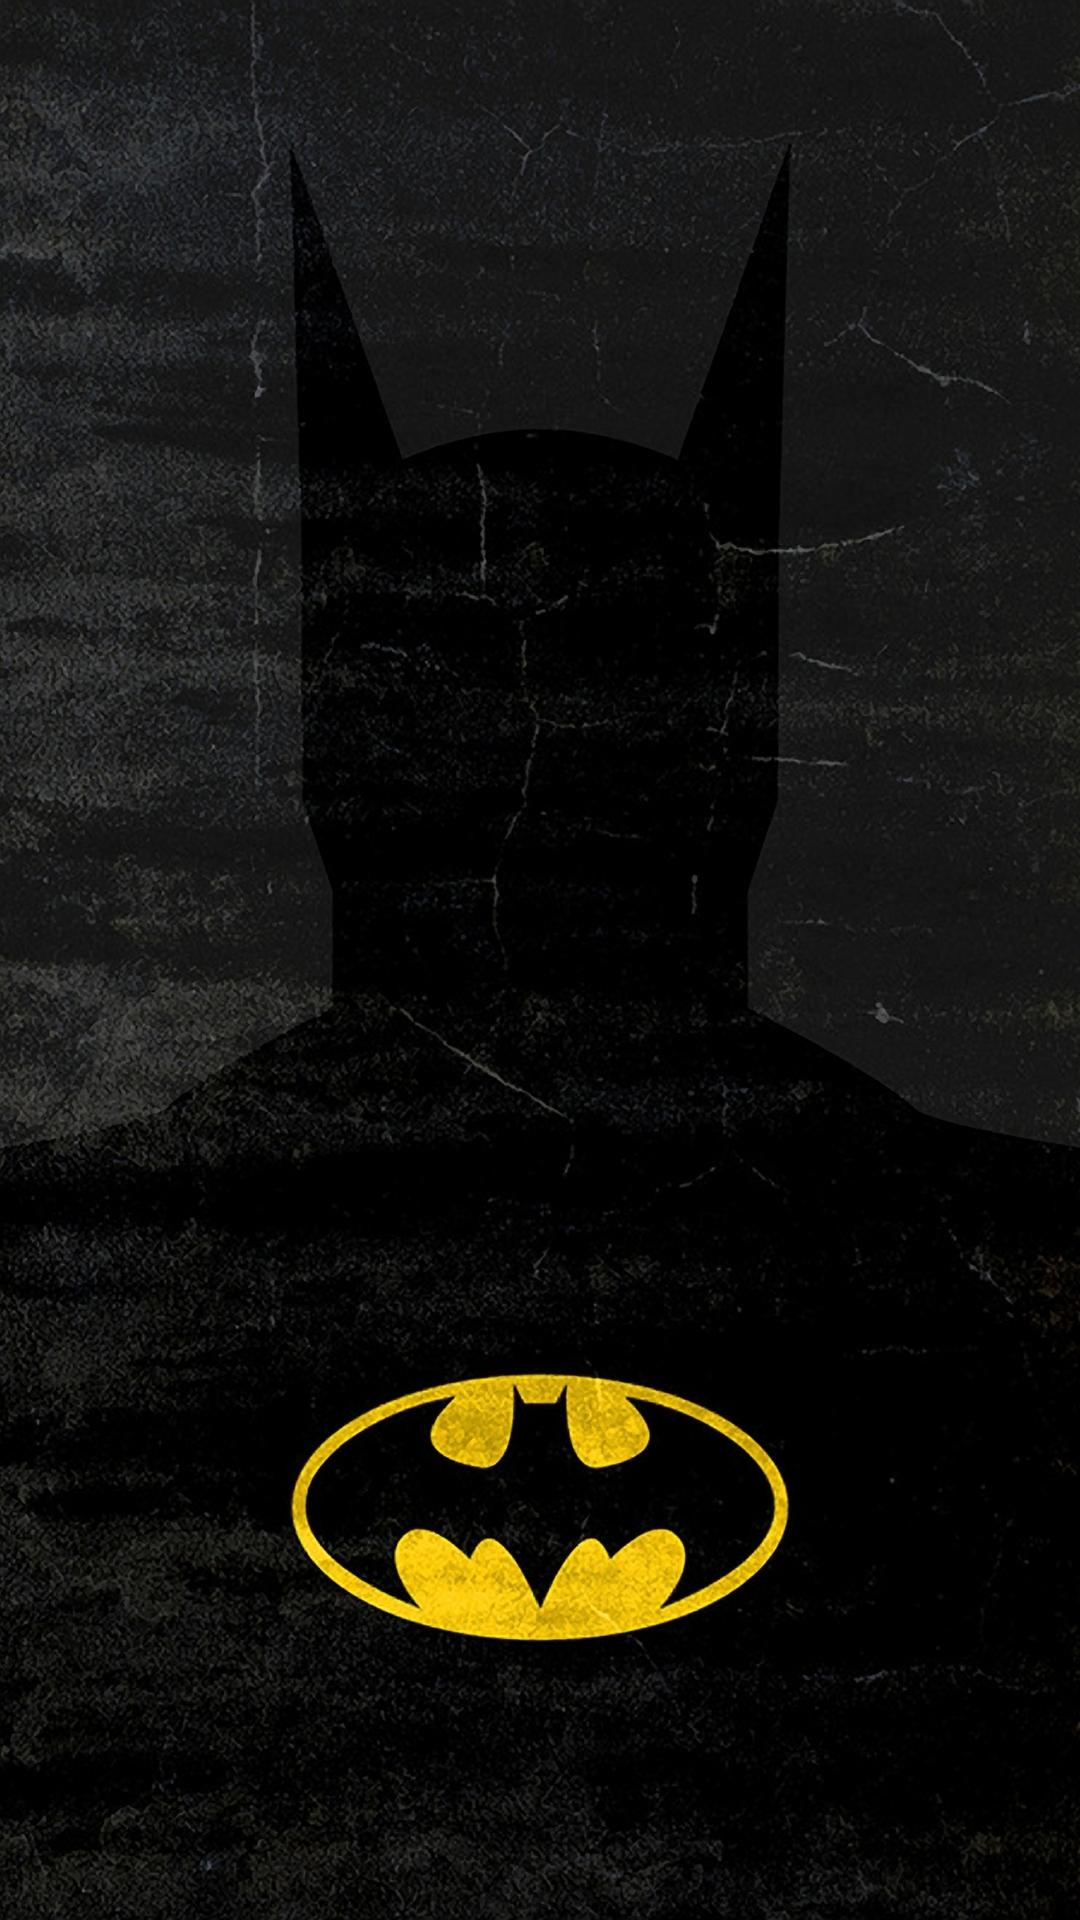 Abstract Batman